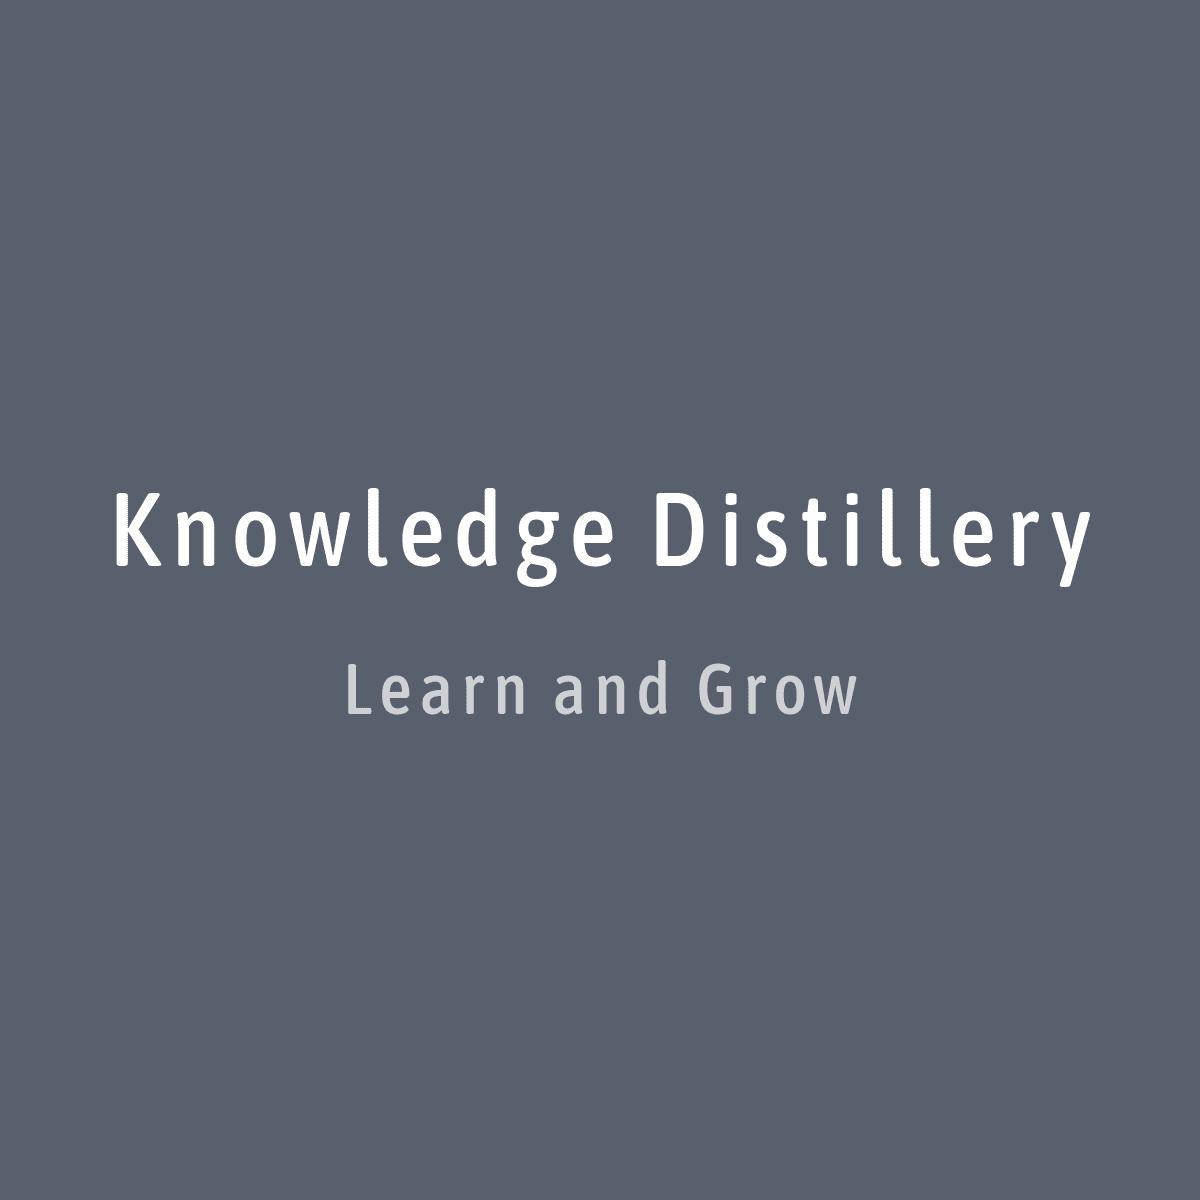 Learn and Grow